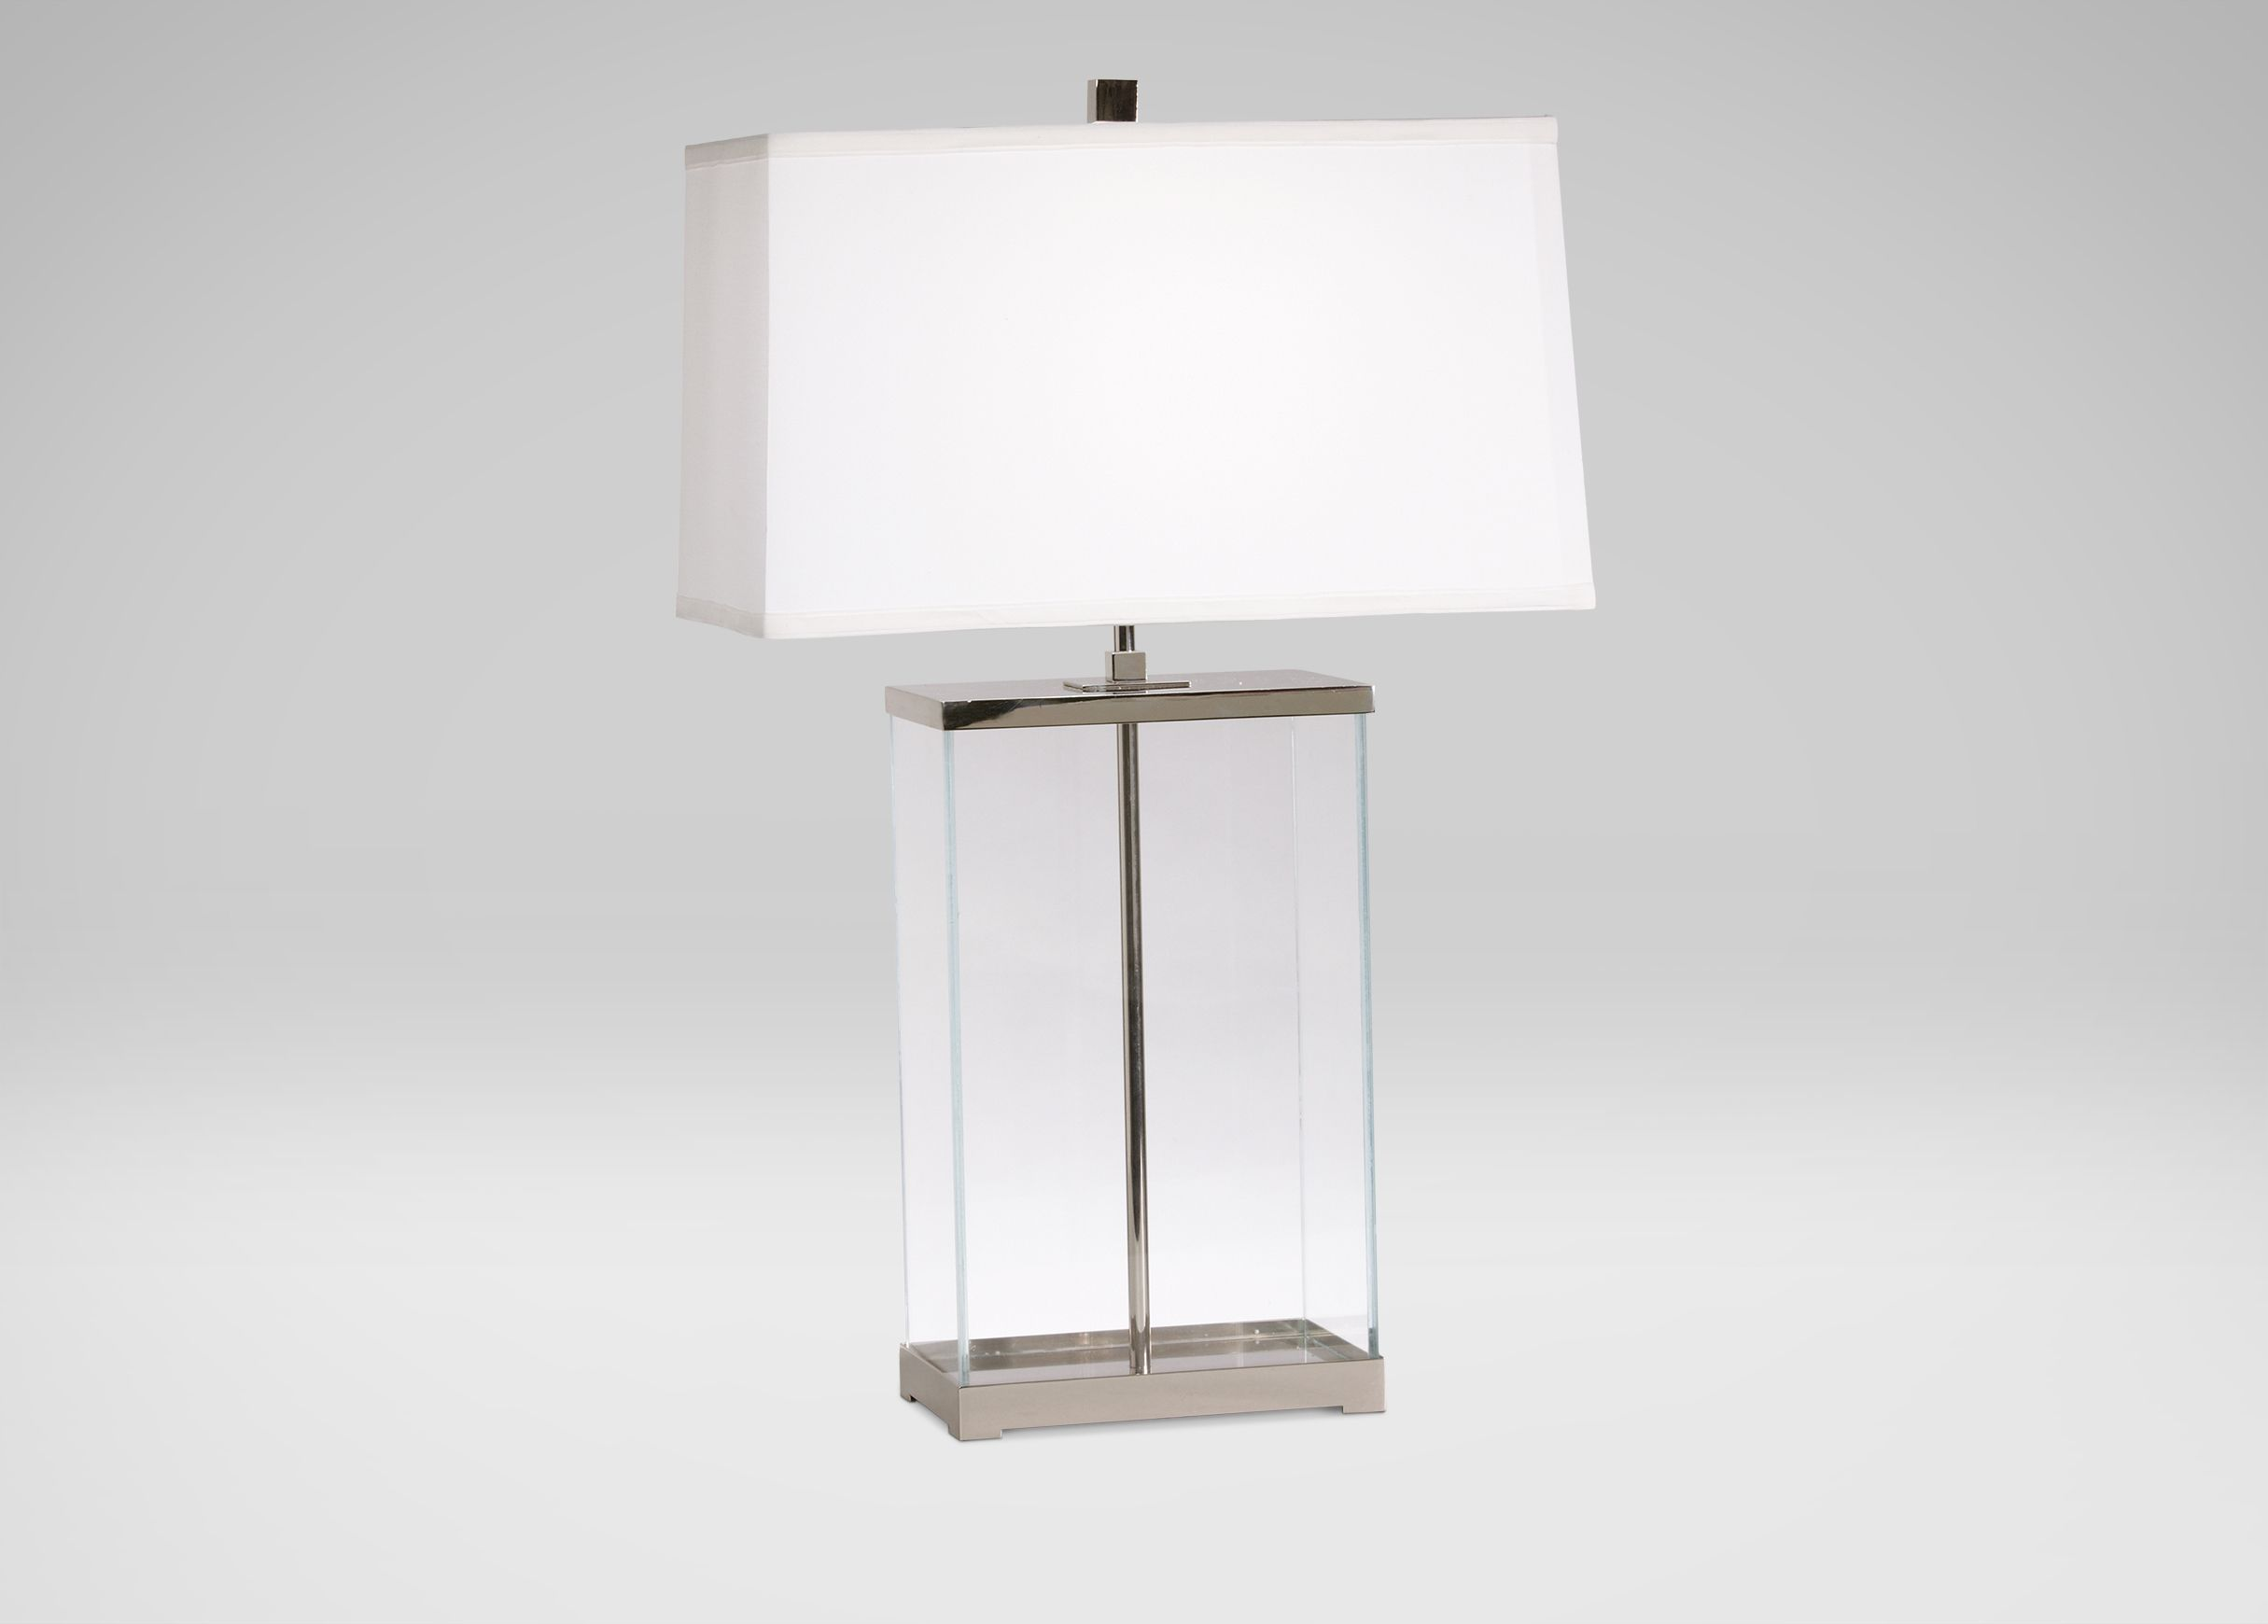 Pin On Lighting Lamps Metal Glass Ceramic